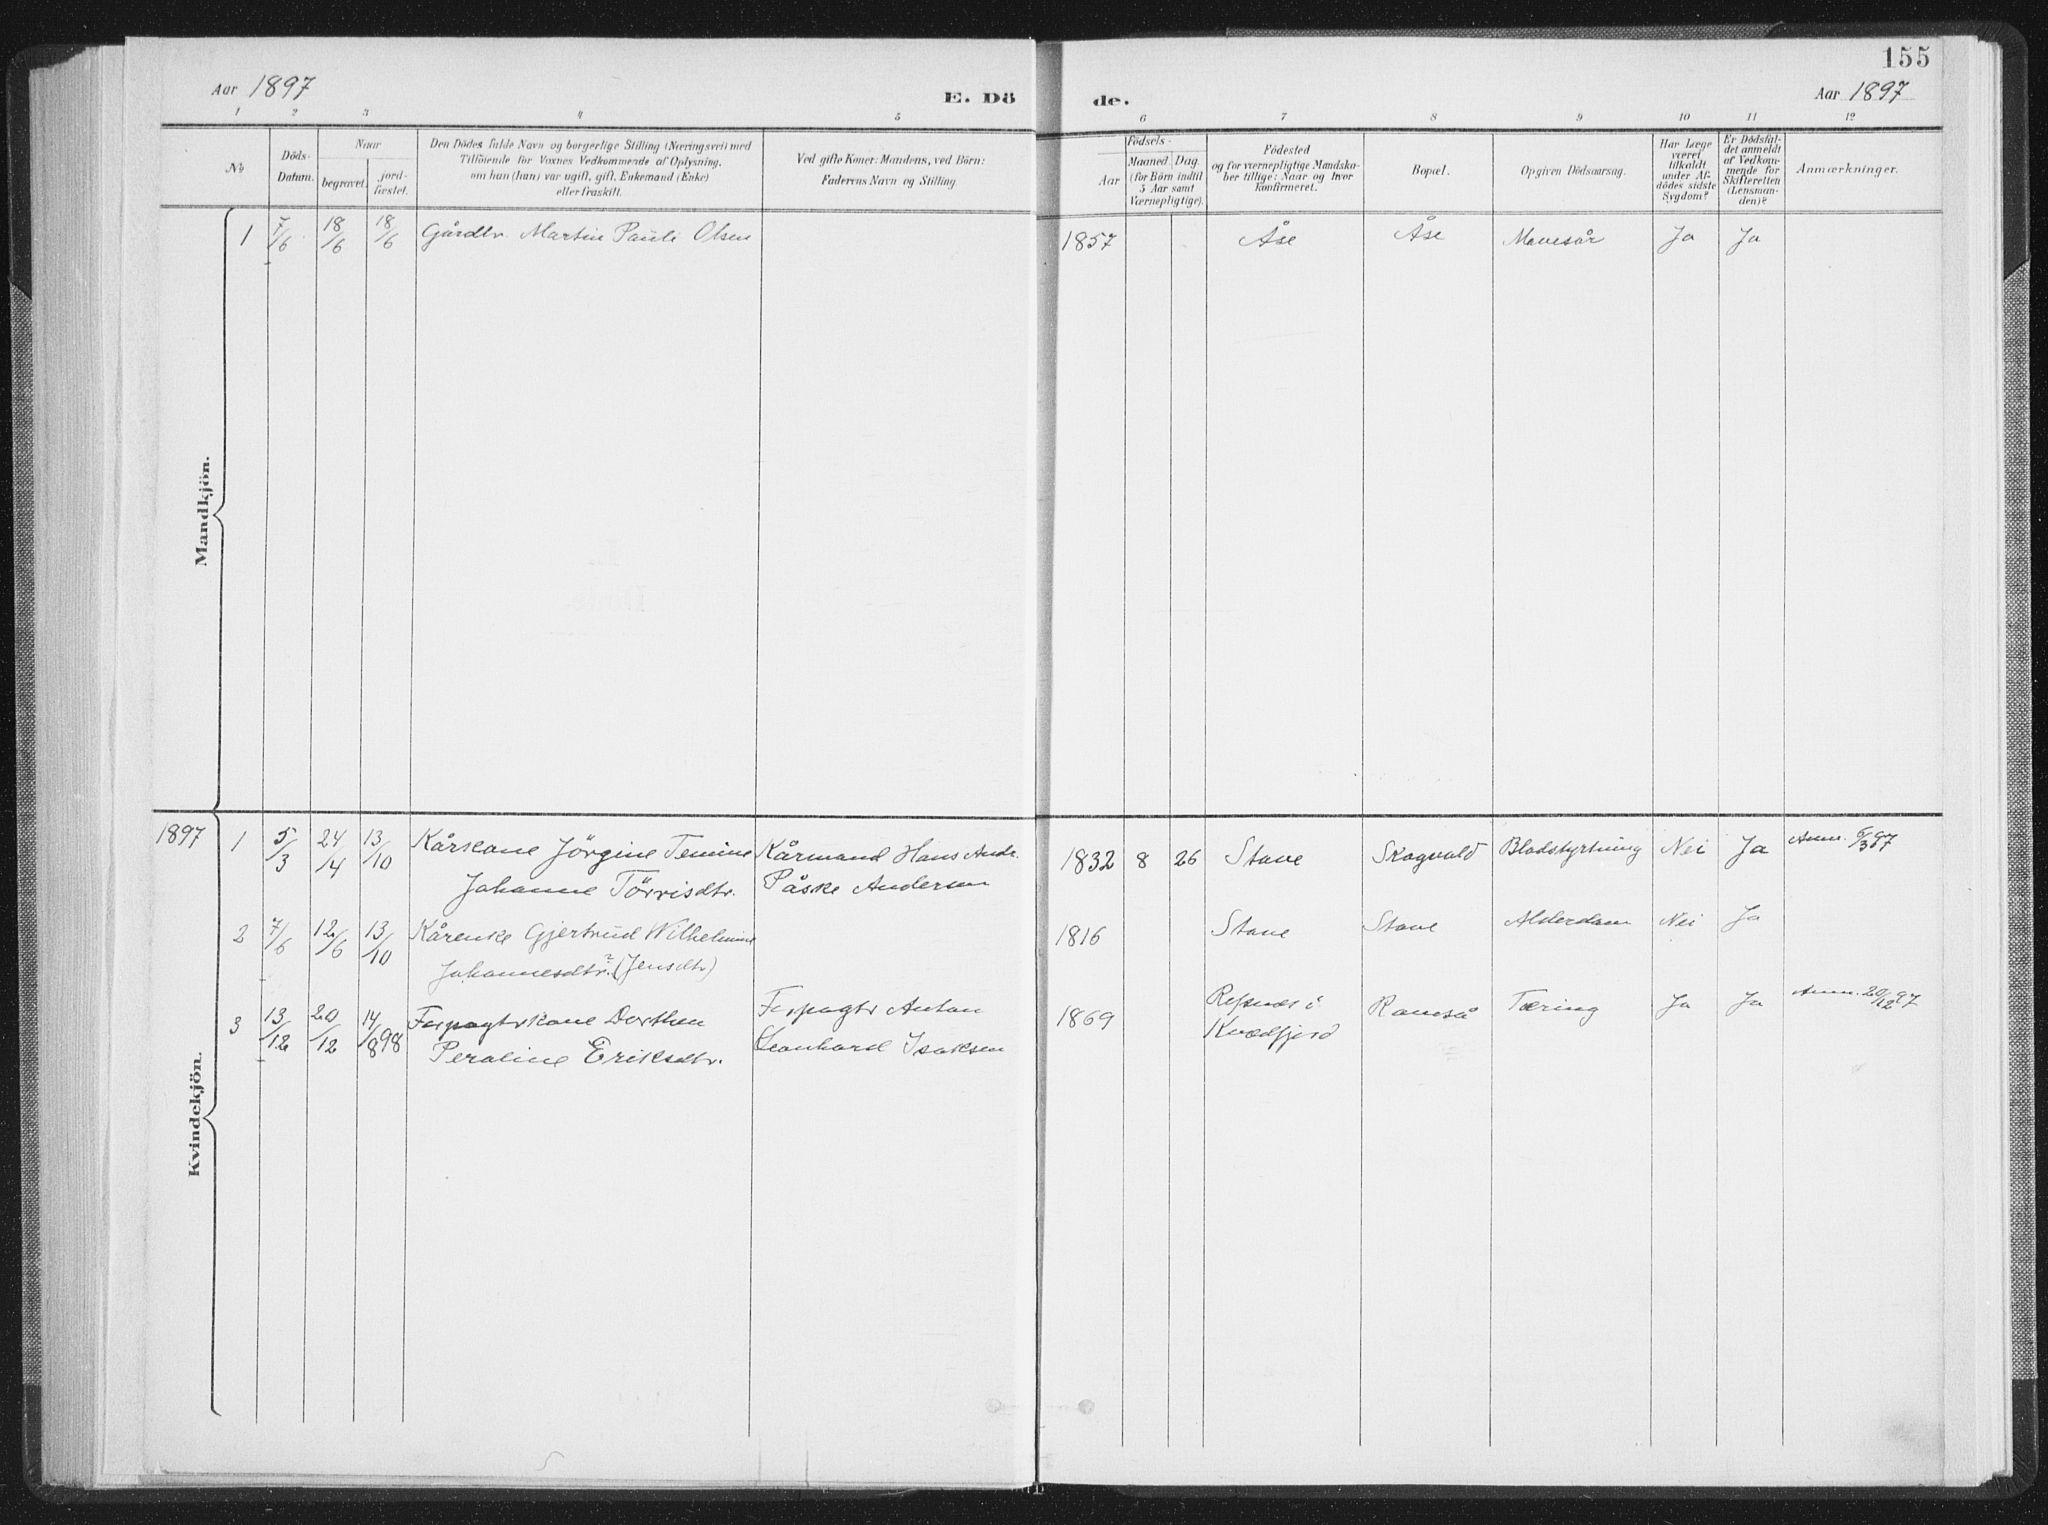 SAT, Ministerialprotokoller, klokkerbøker og fødselsregistre - Nordland, 897/L1400: Ministerialbok nr. 897A07, 1897-1908, s. 155